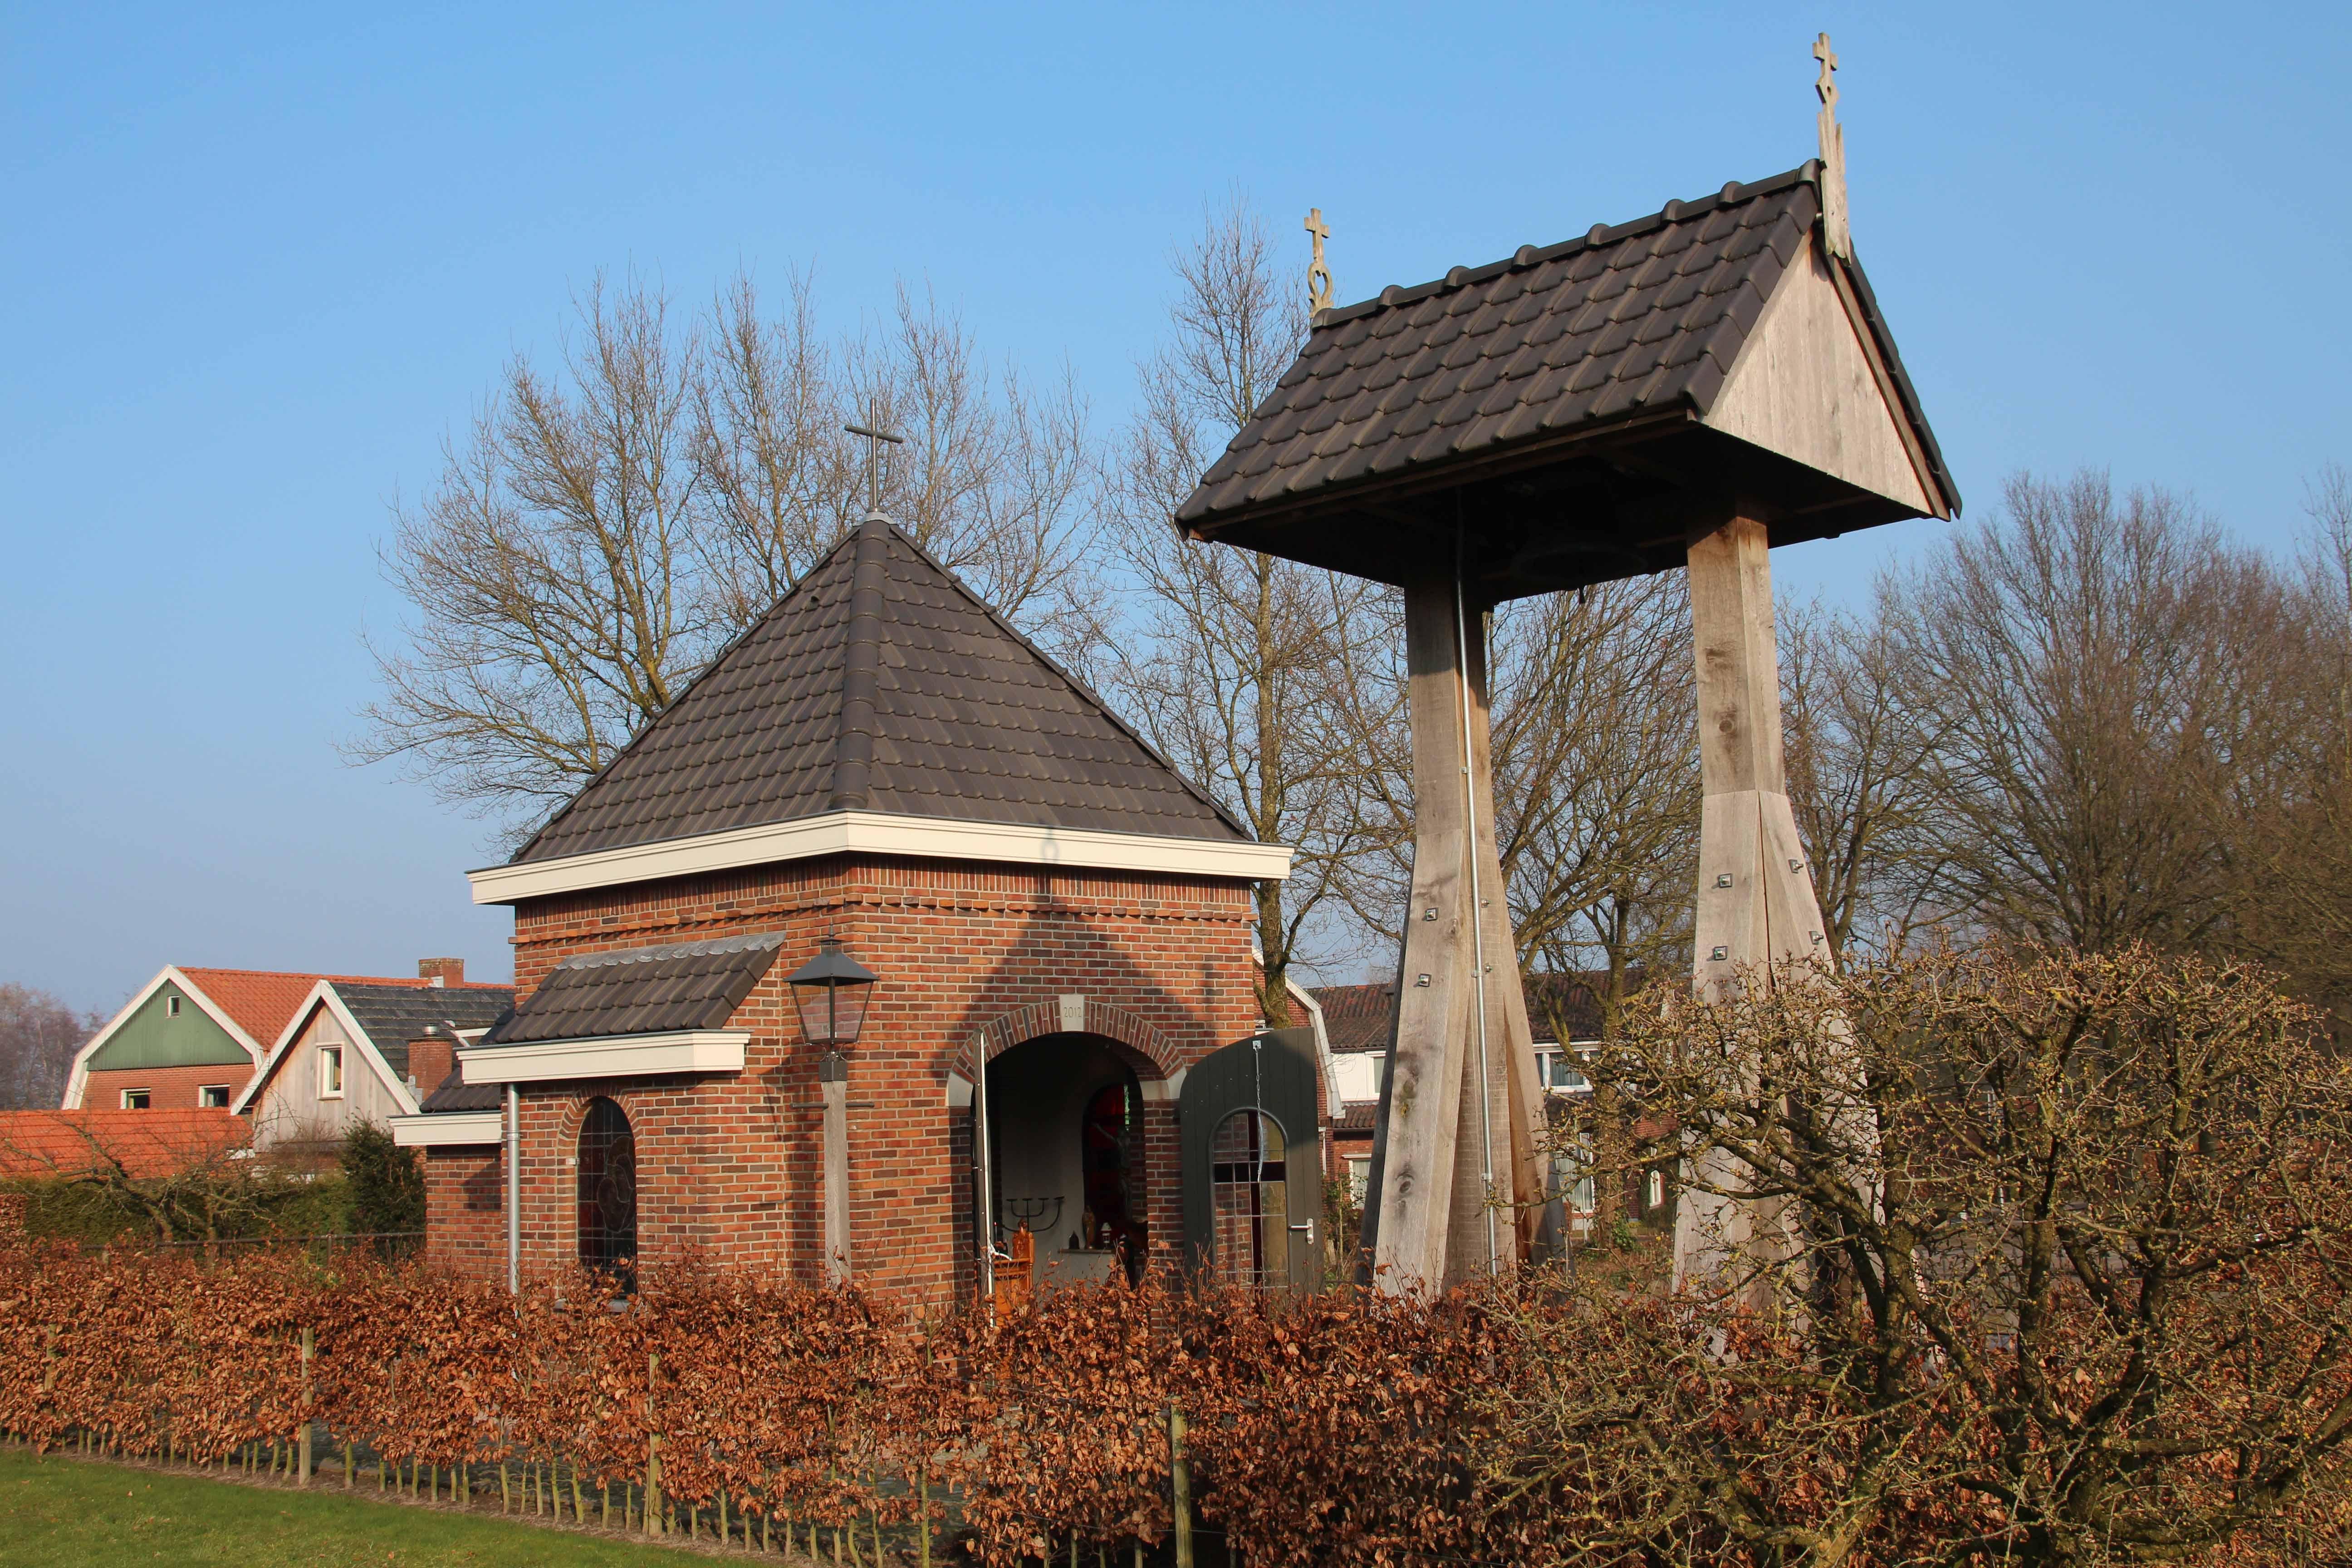 113. Mariakapel Oldenzaalsevoetpad in Ootmarsum